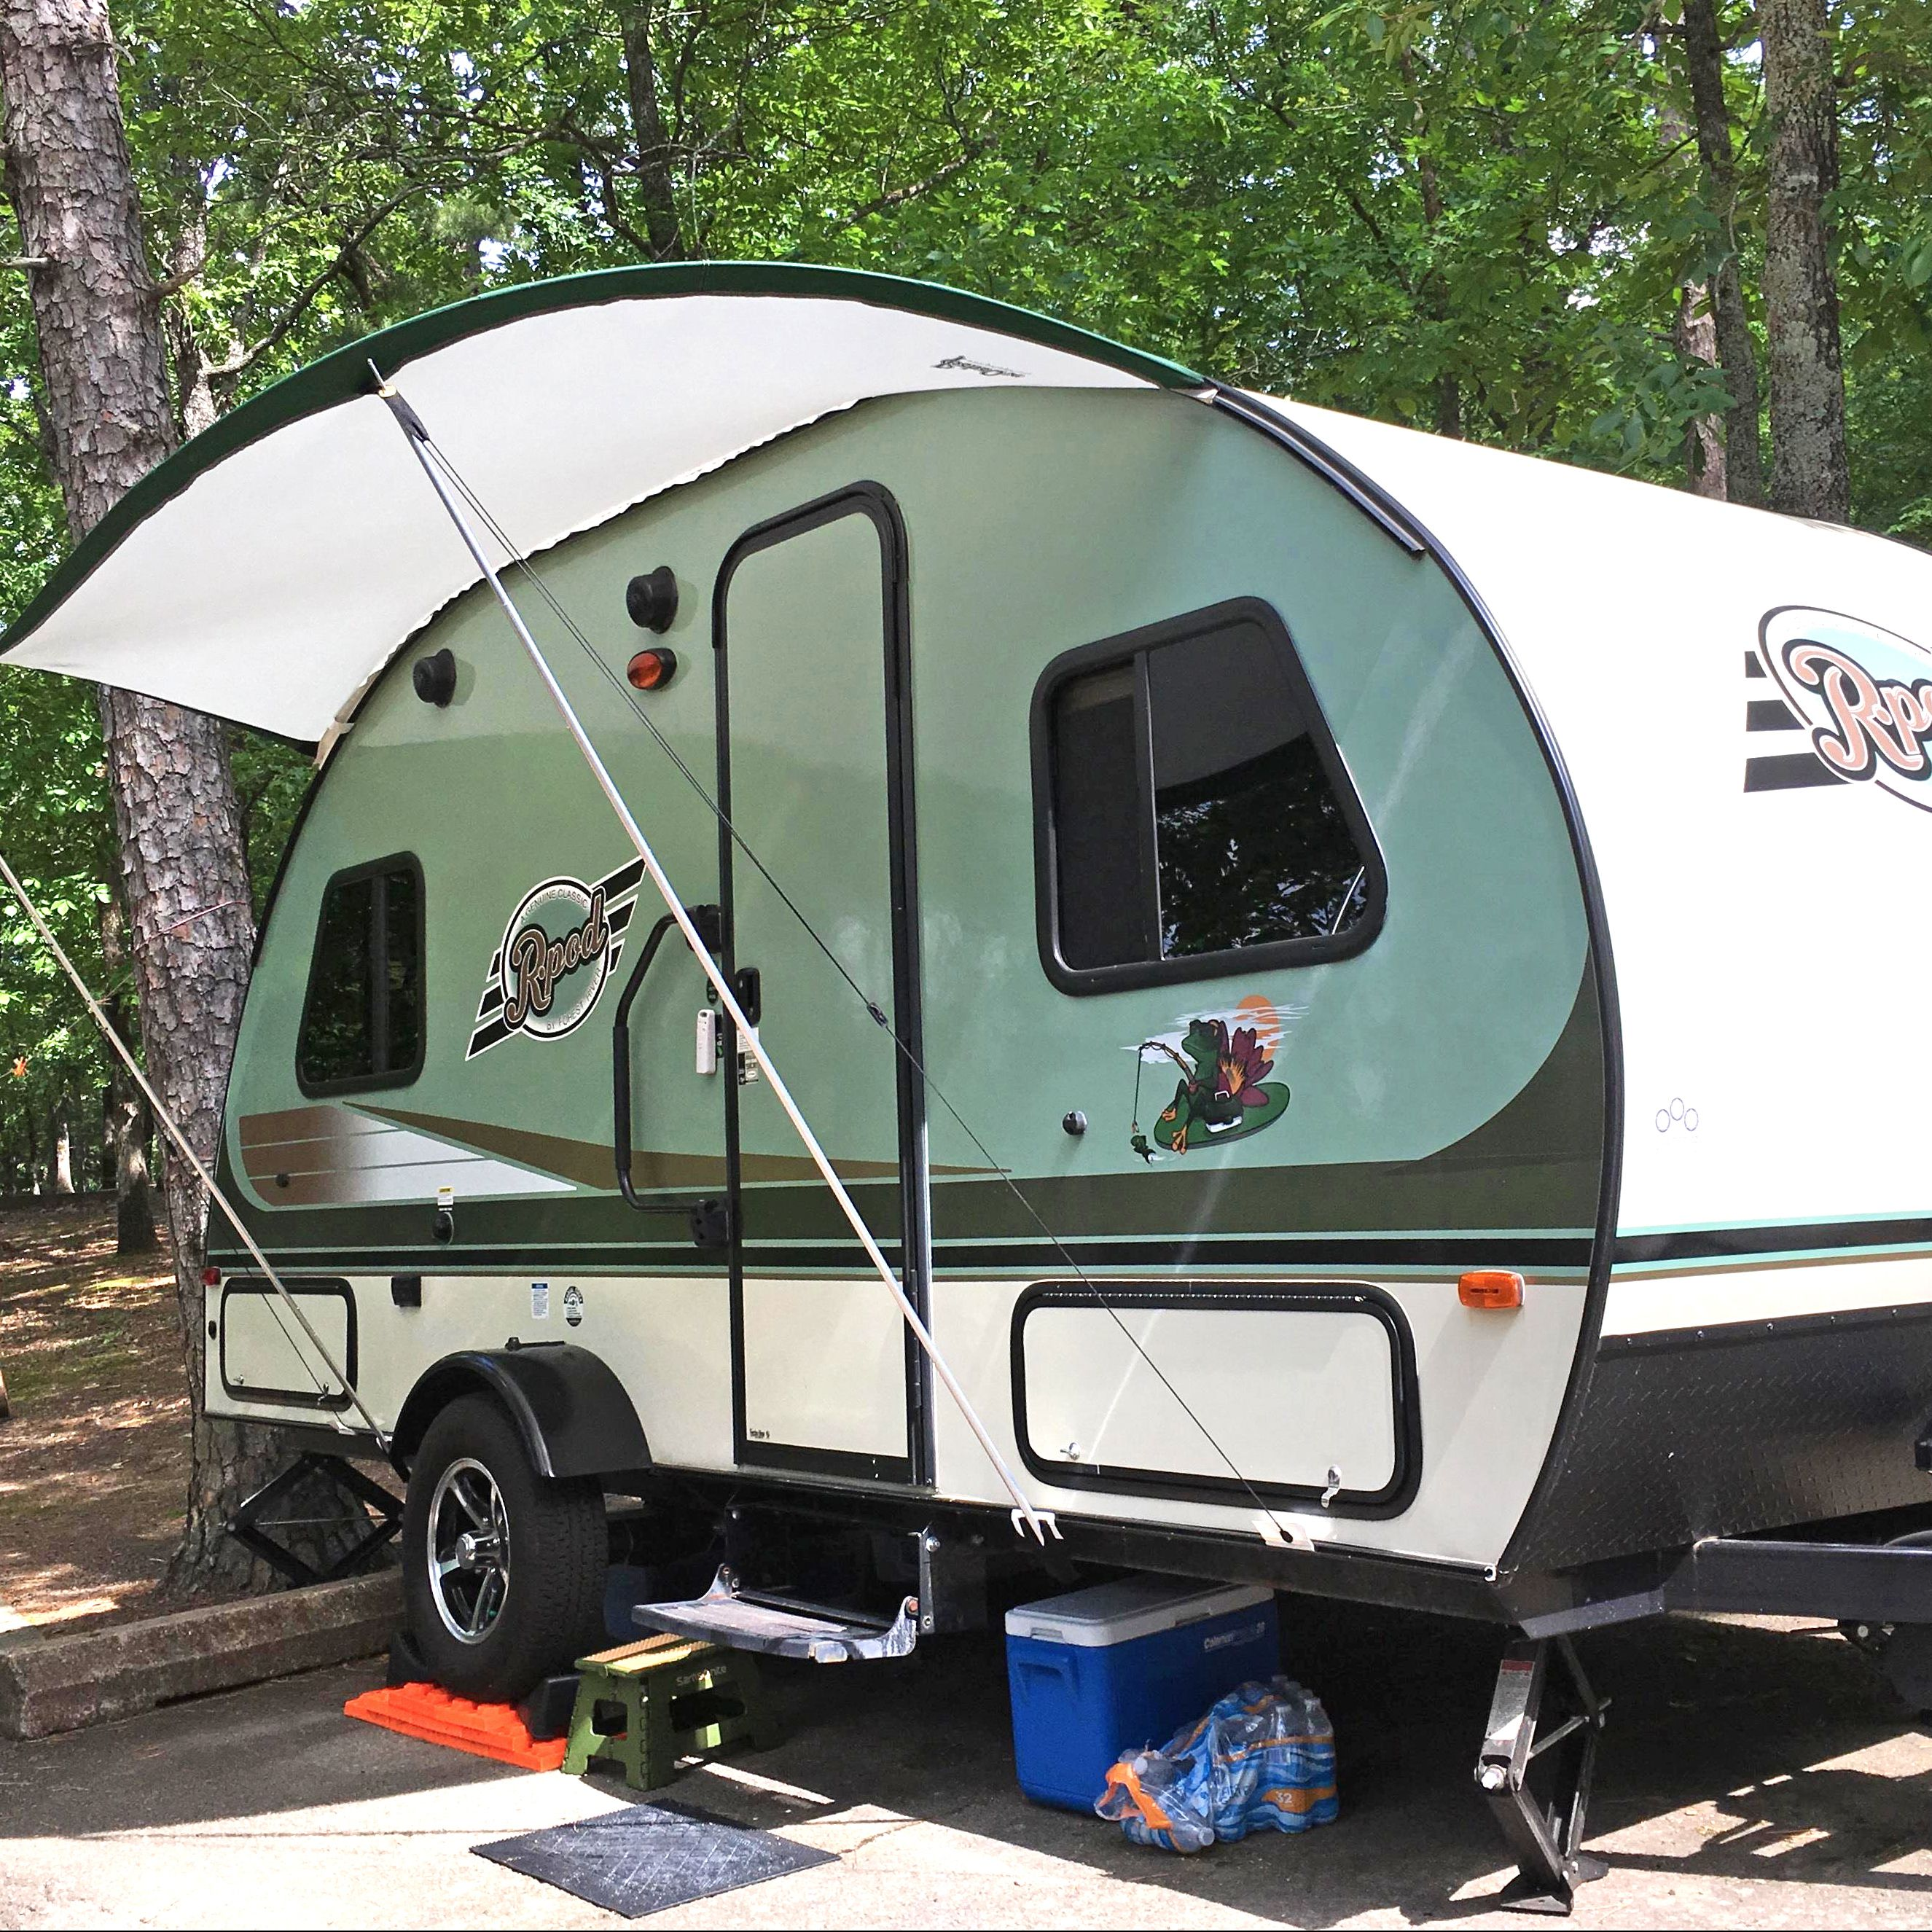 R Pod Trailer Visor R Pod Pod Camper Family Camping